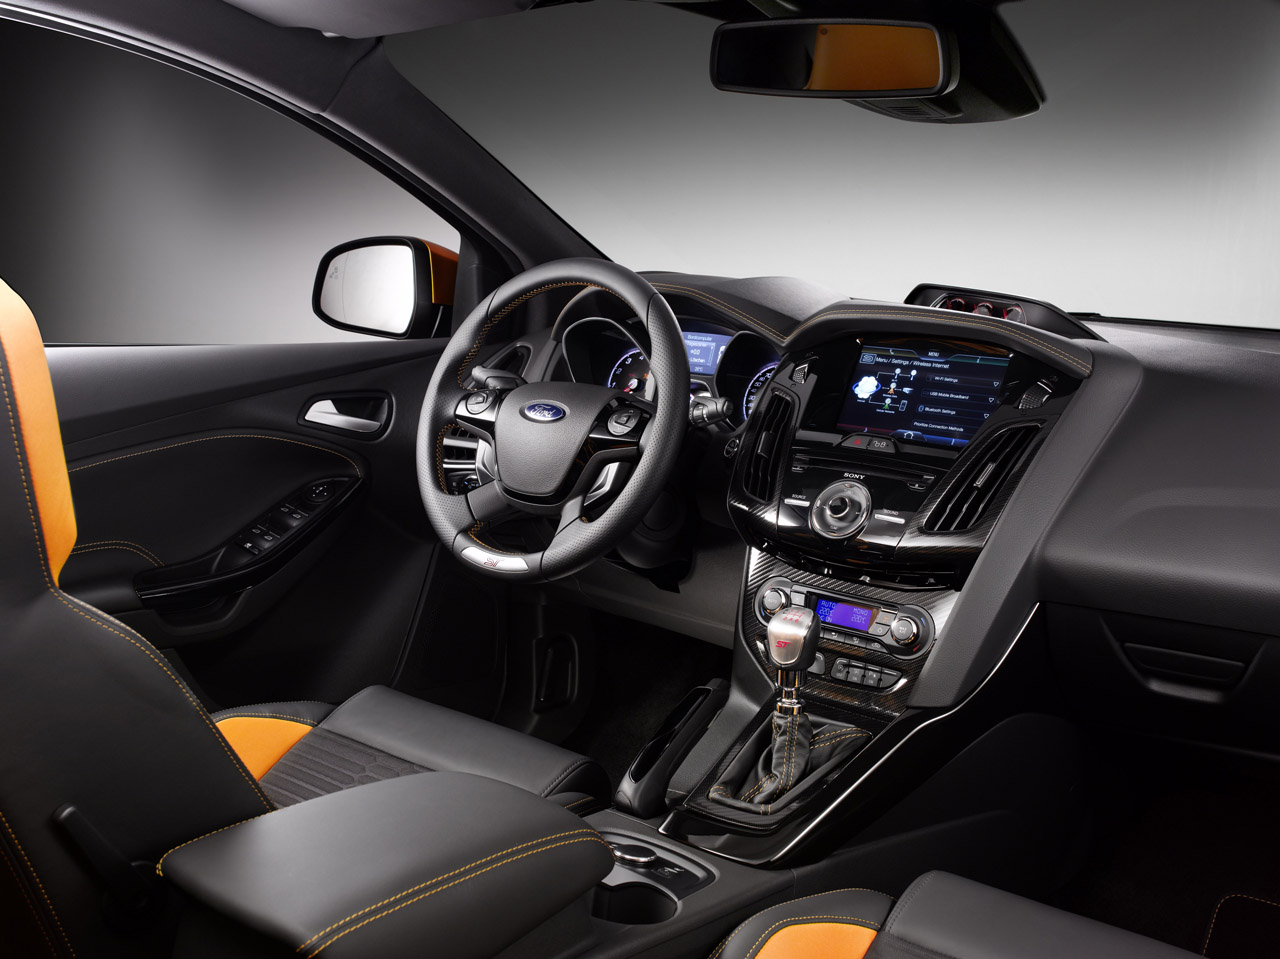 2012 Ford Focus ST Press